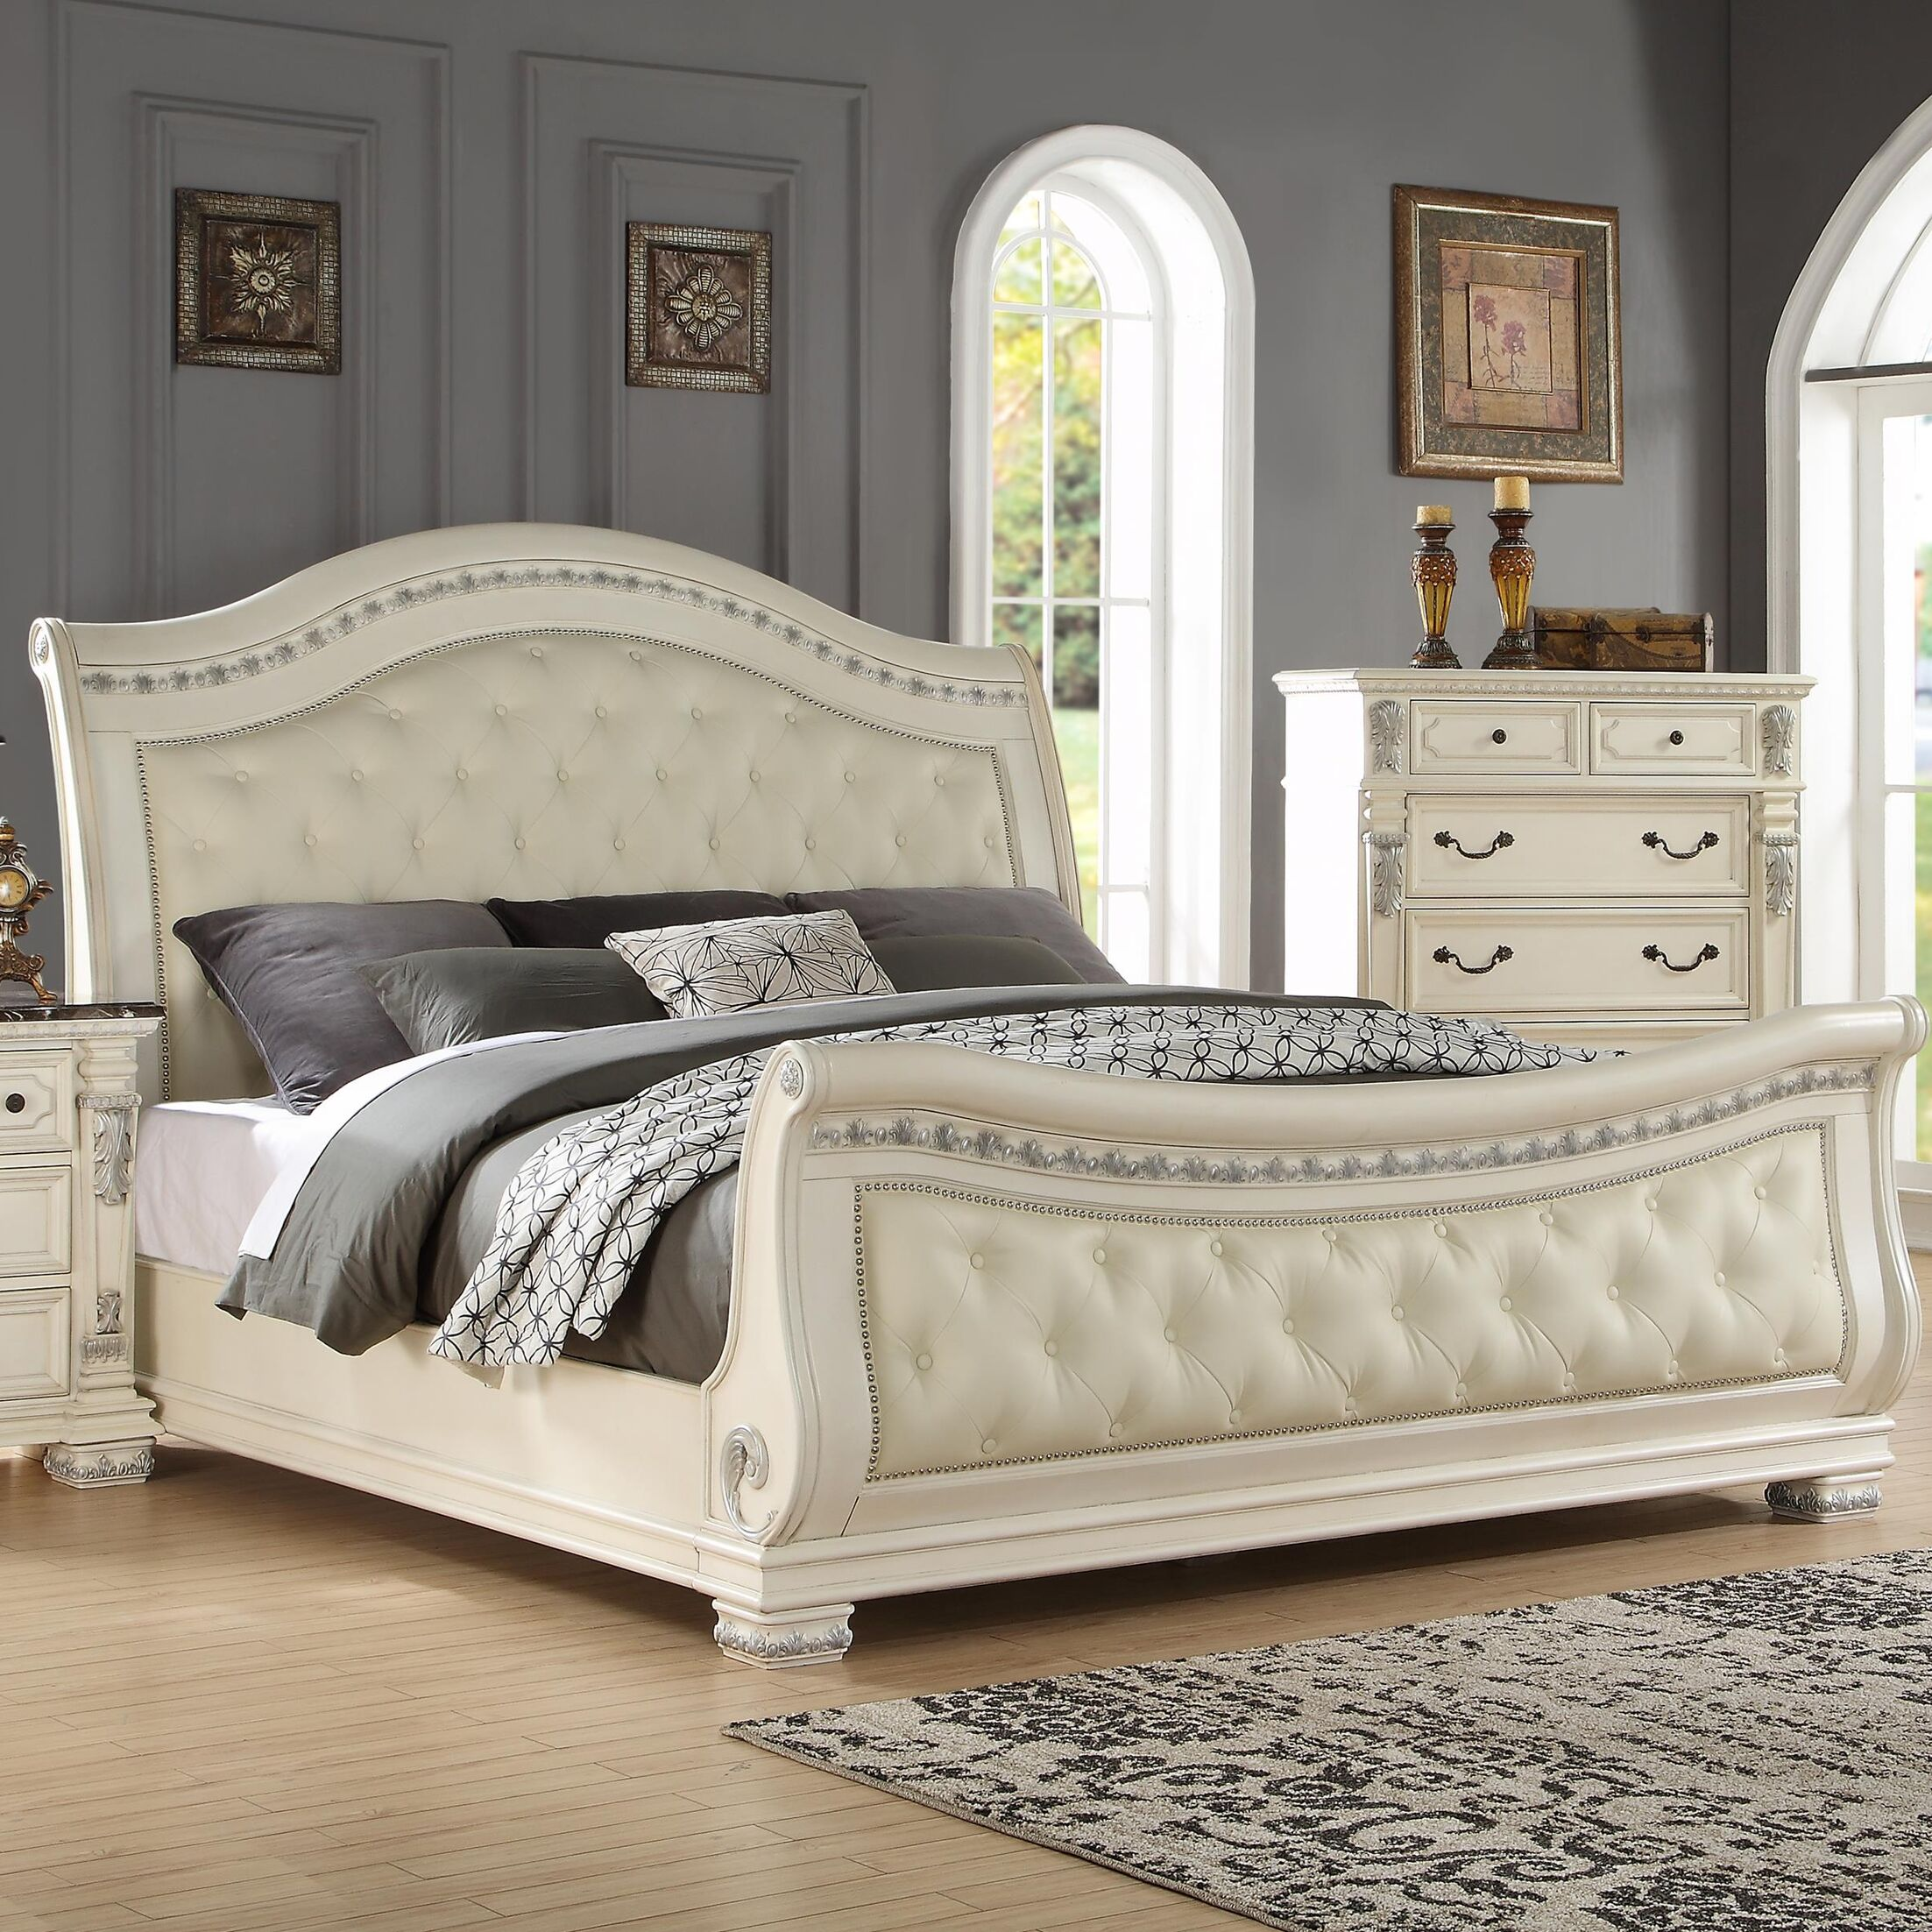 Alexandra Upholstered Sleigh Bed Size: California King